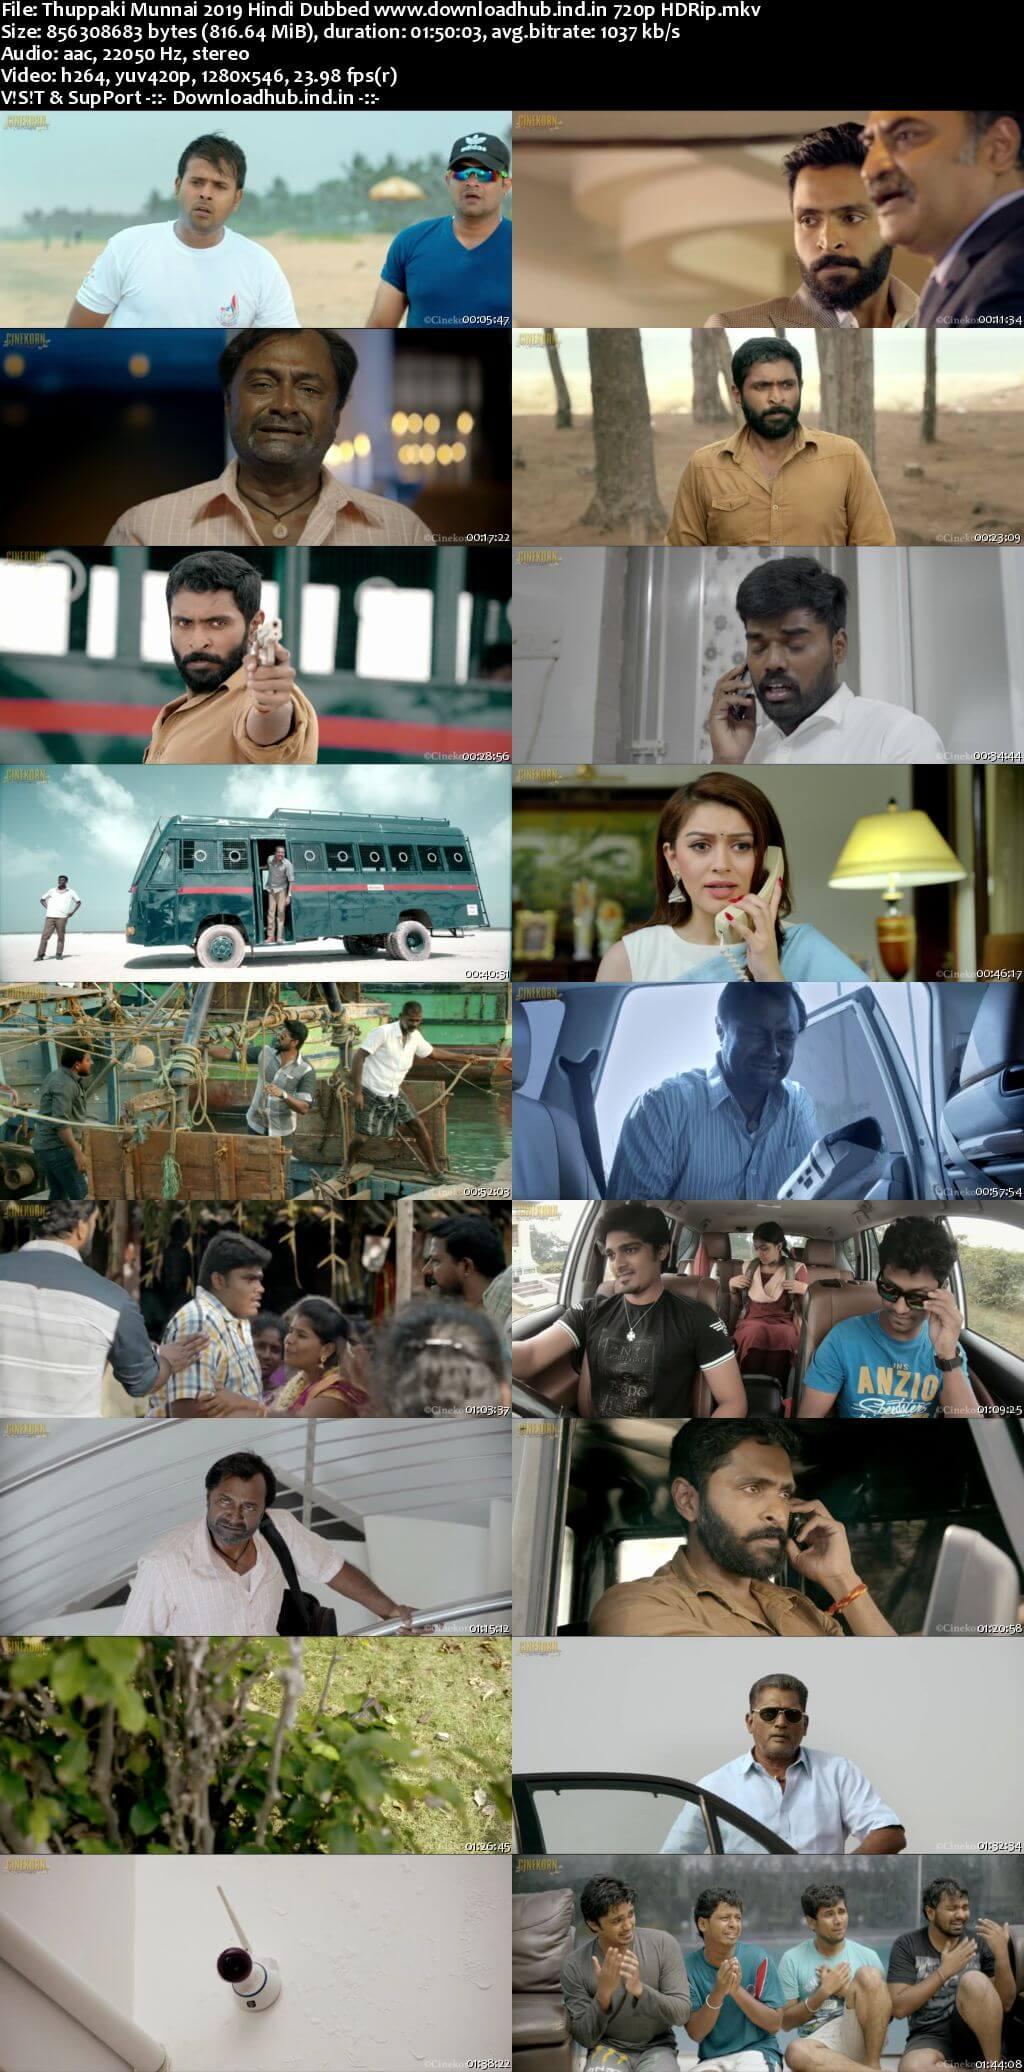 Thuppaki Munnai 2019 Hindi Dubbed 720p HDRip x264